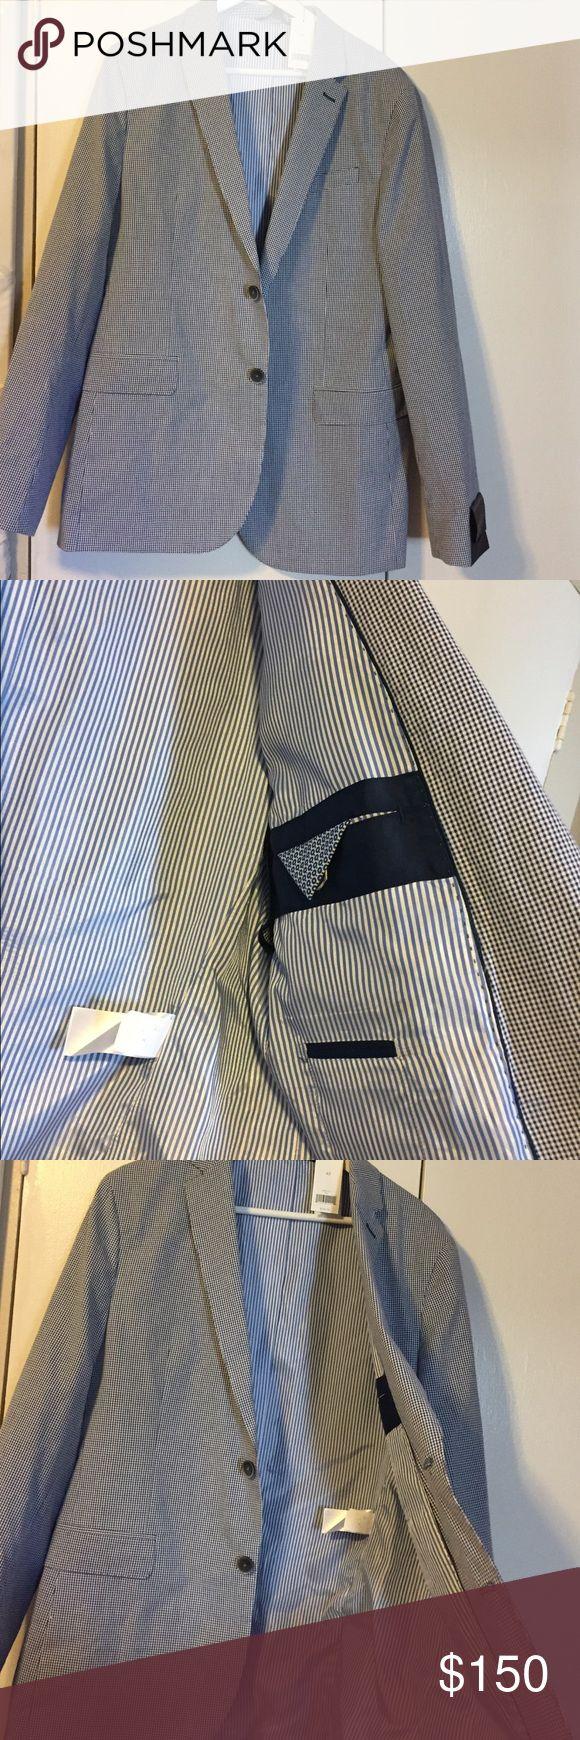 Selling this Men's Banana Republic White& Blue Checkered Blazer on Poshmark! My username is: macurtis11. #shopmycloset #poshmark #fashion #shopping #style #forsale #Banana Republic #Other